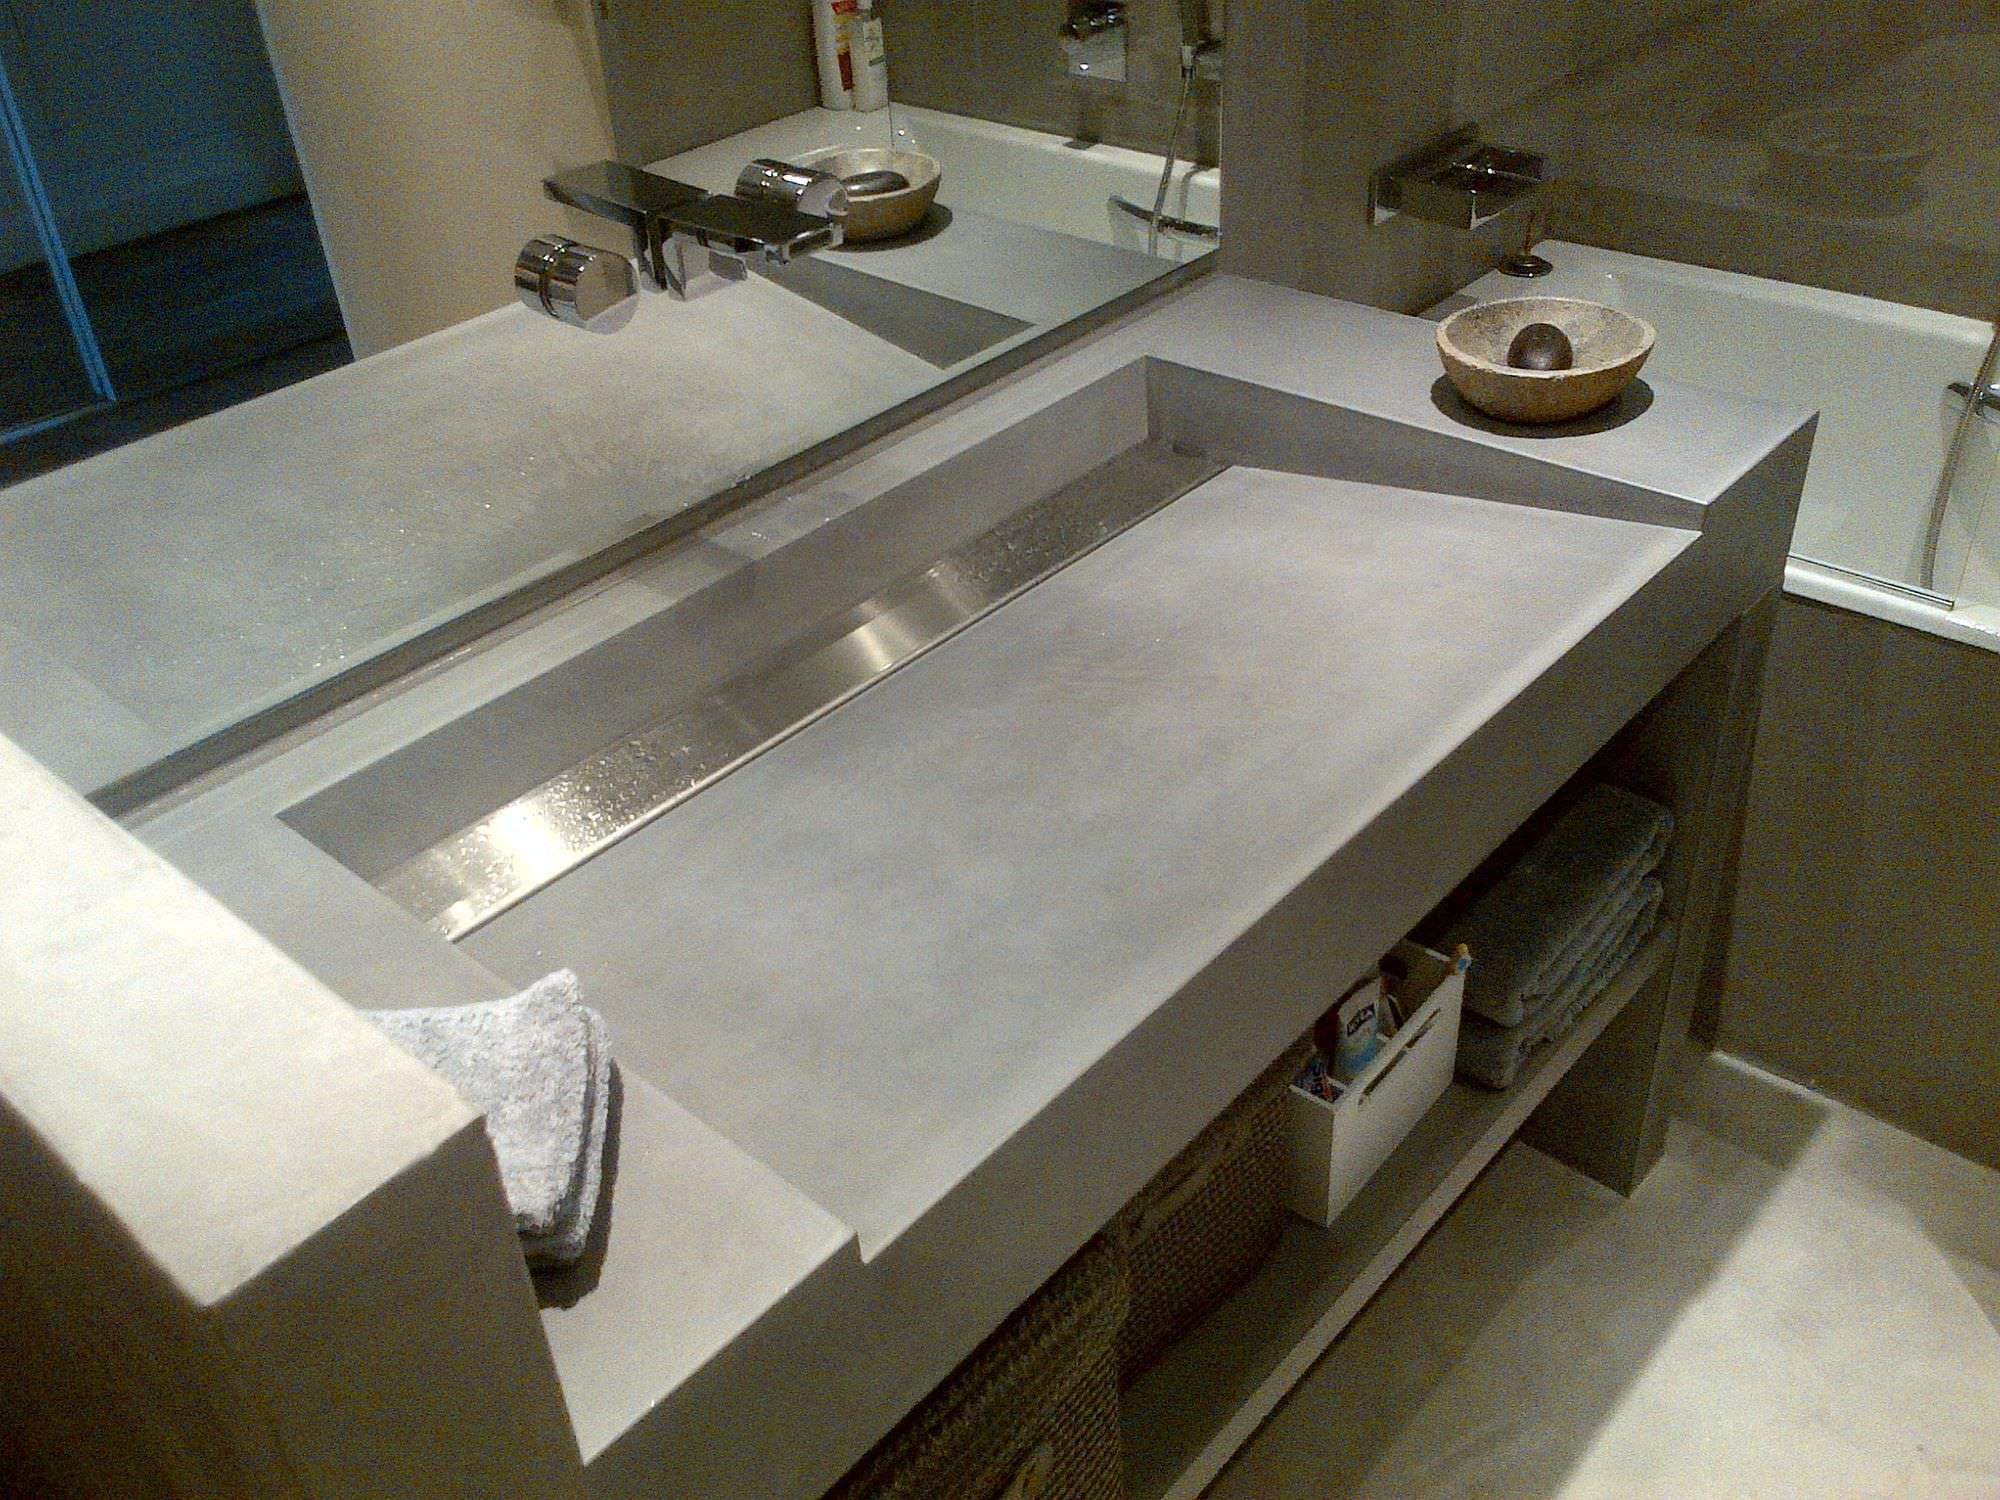 Muebles de lavabo de obra interesting reforma bao con for Bajo lavabo de obra